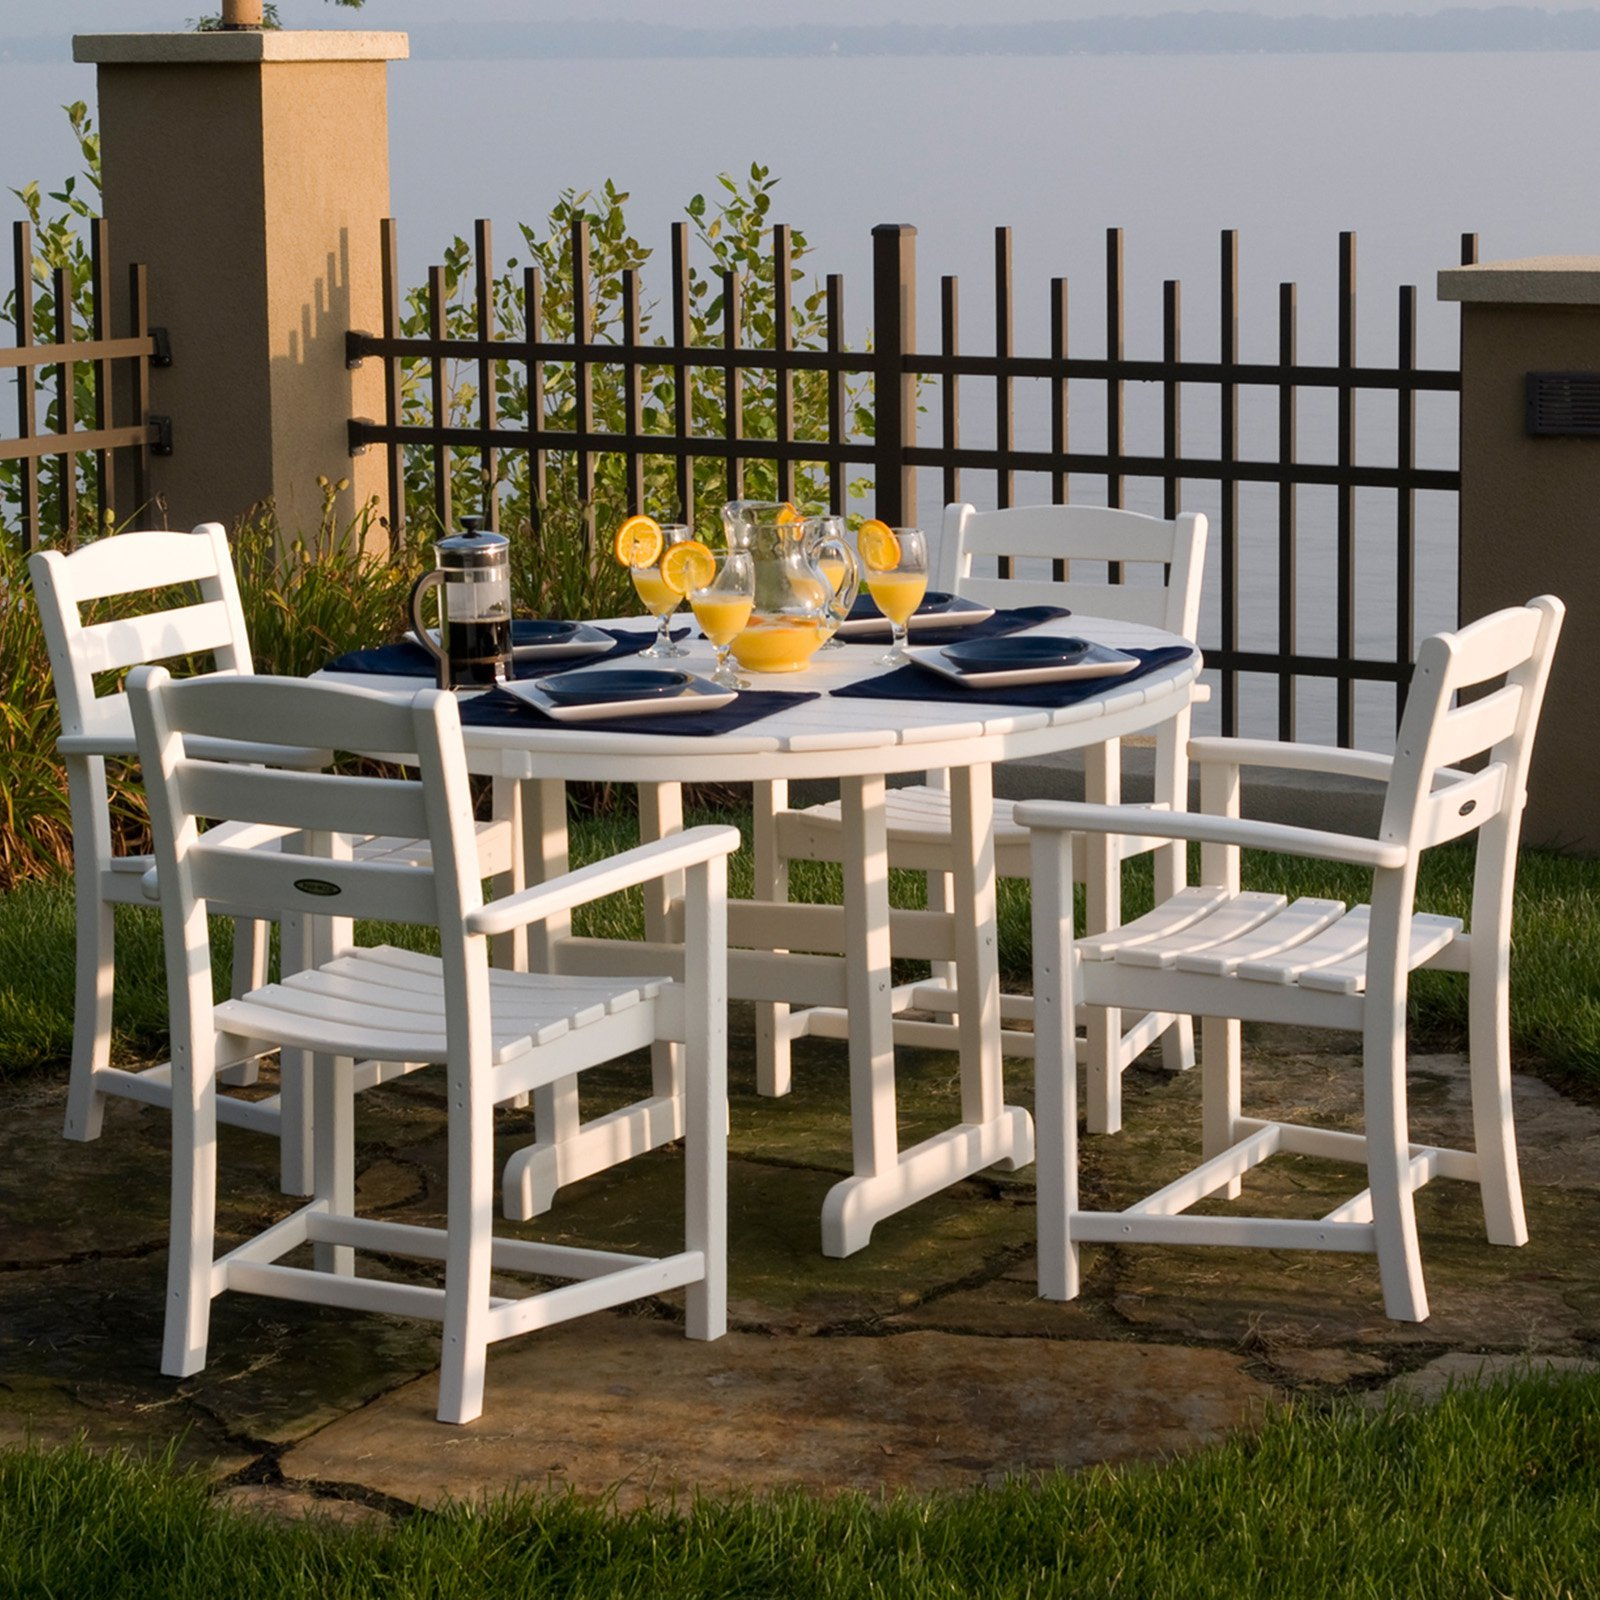 POLYWOOD® La Casa Cafe Dining Set - Seats 4